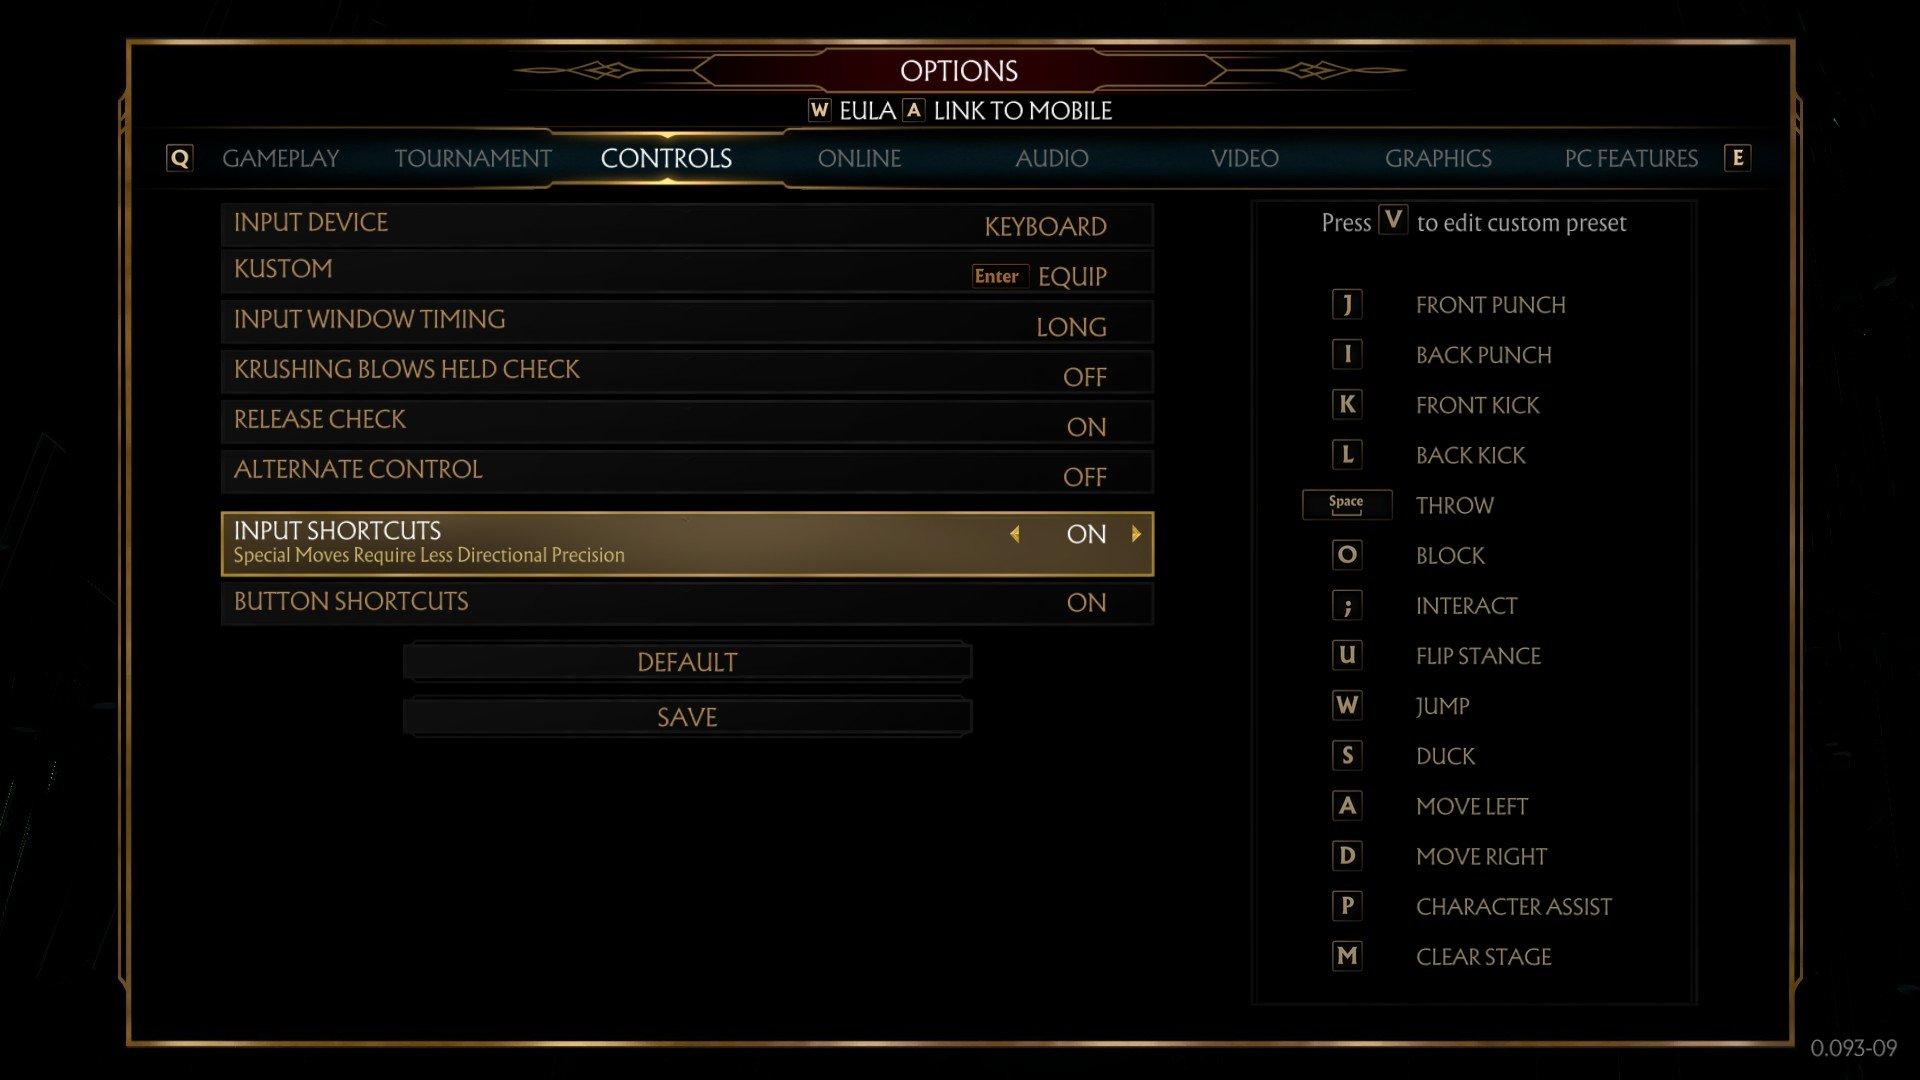 Mortal Kombat 11 PC controls and keybindings